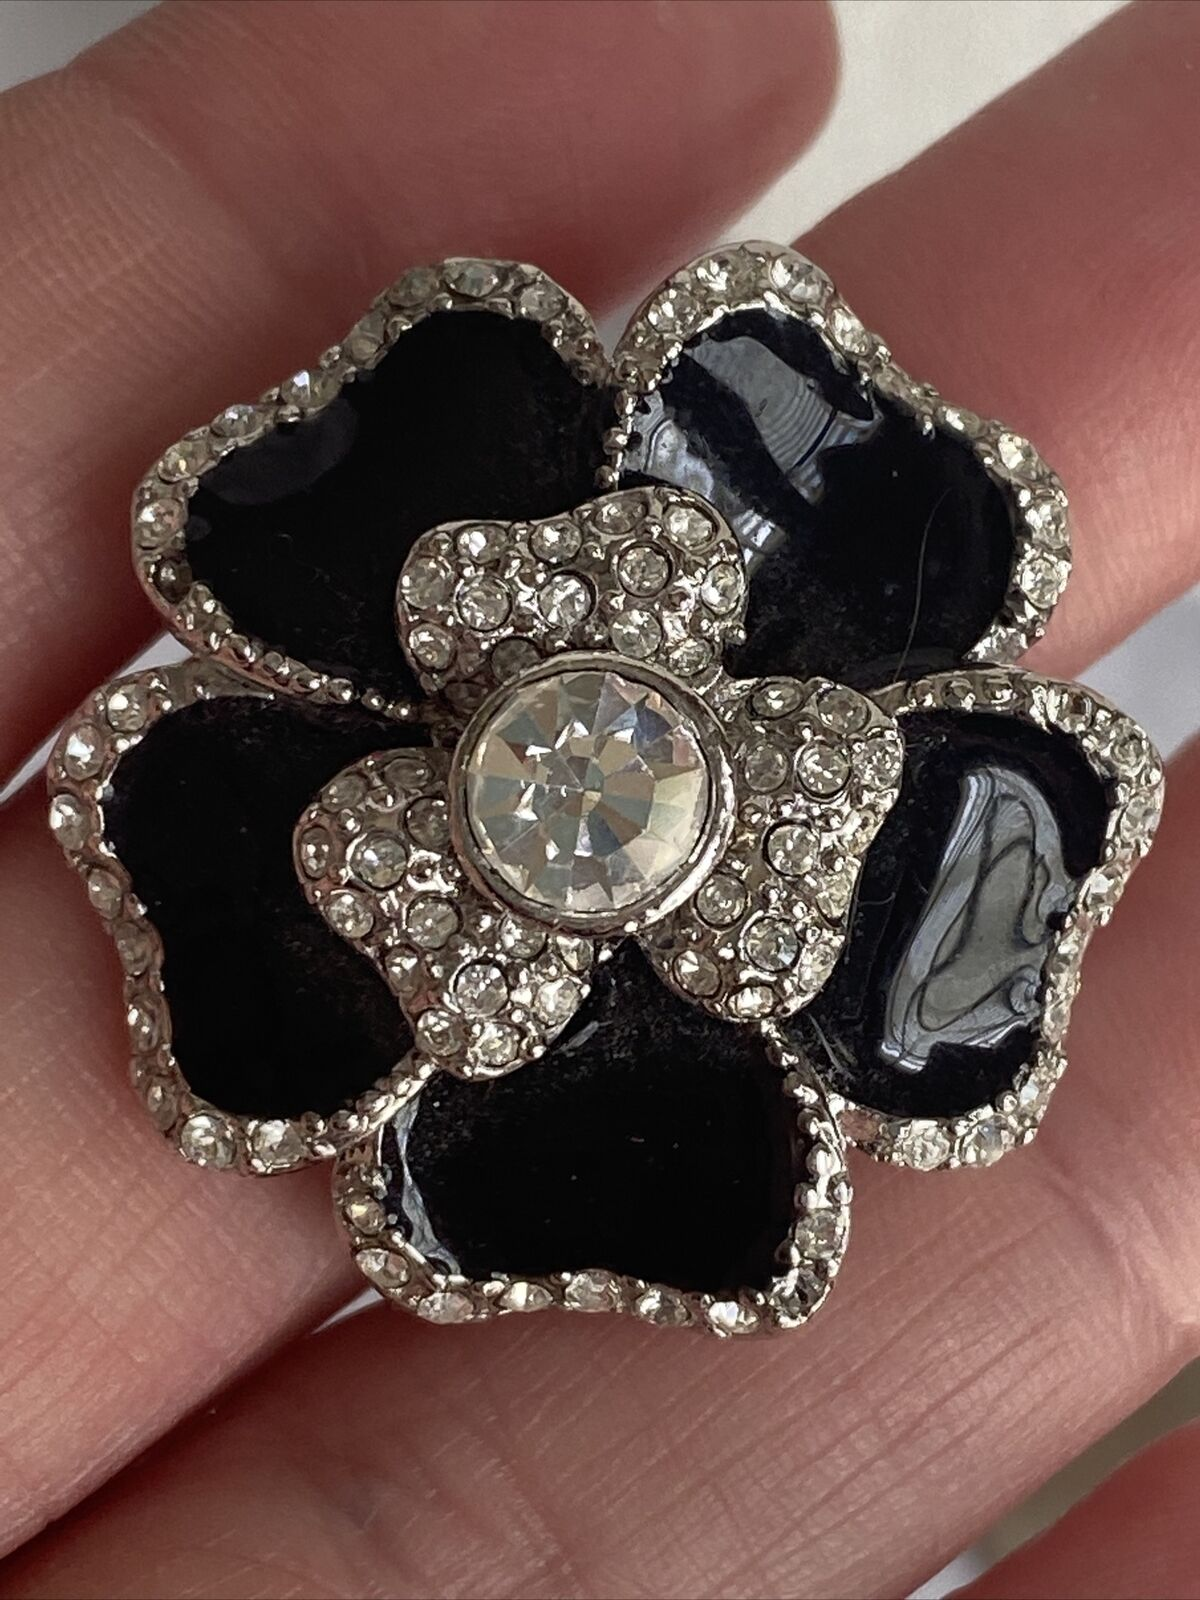 Rhinestones Corsage Stretch Bracelet Lia Sophia Black Dahlia Bracelet Black